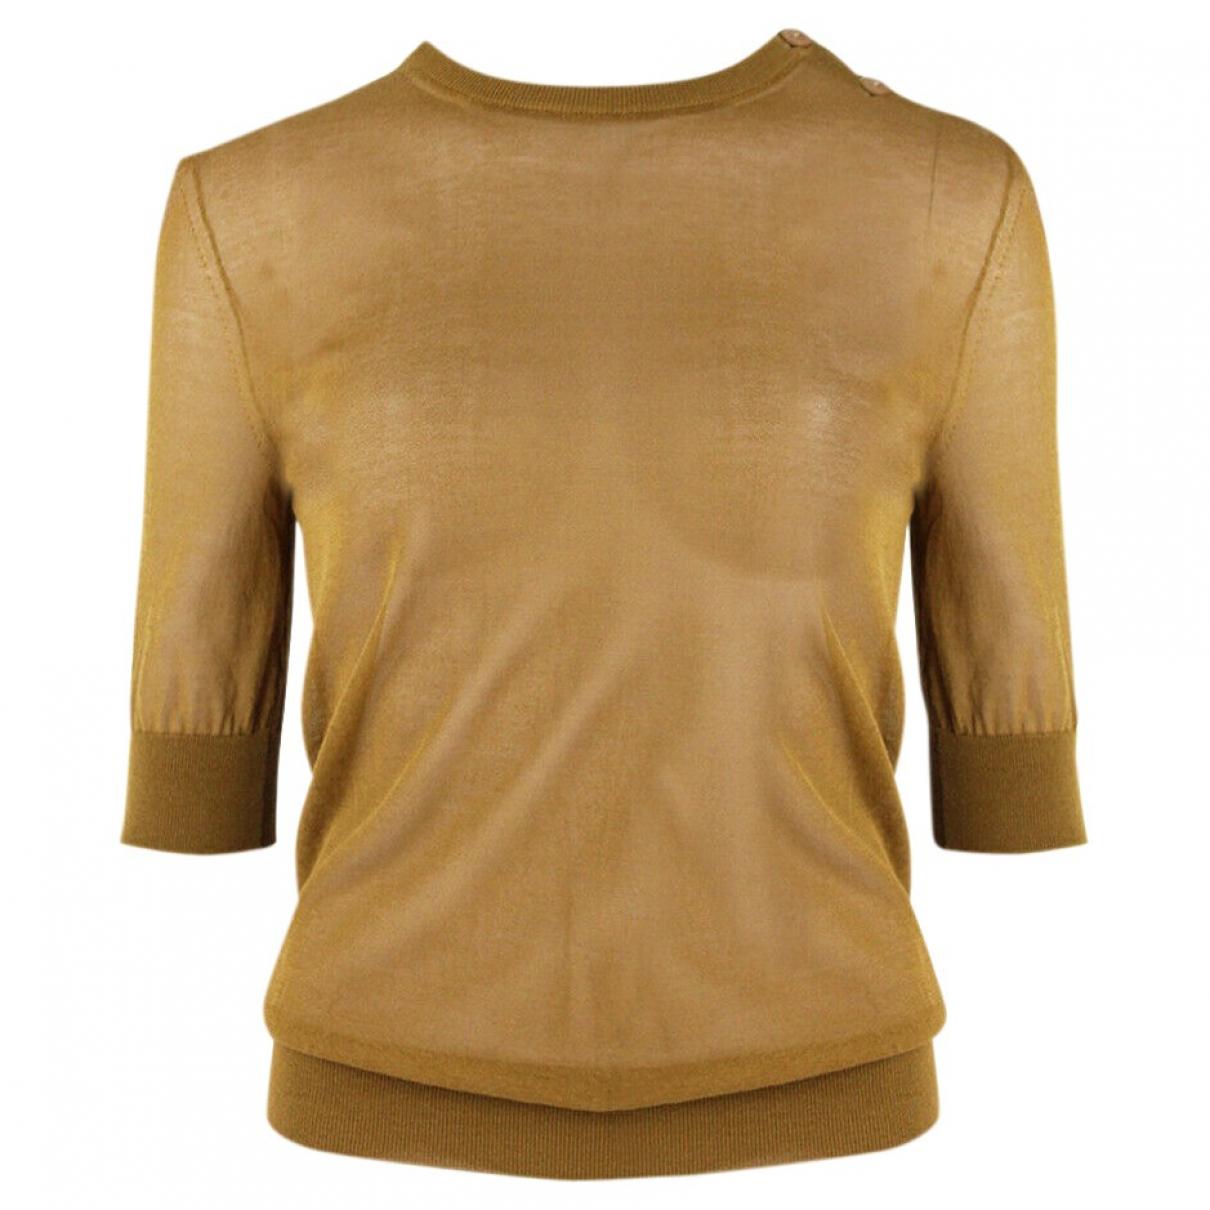 Nina Ricci \N Camel Cotton Knitwear for Women XS International